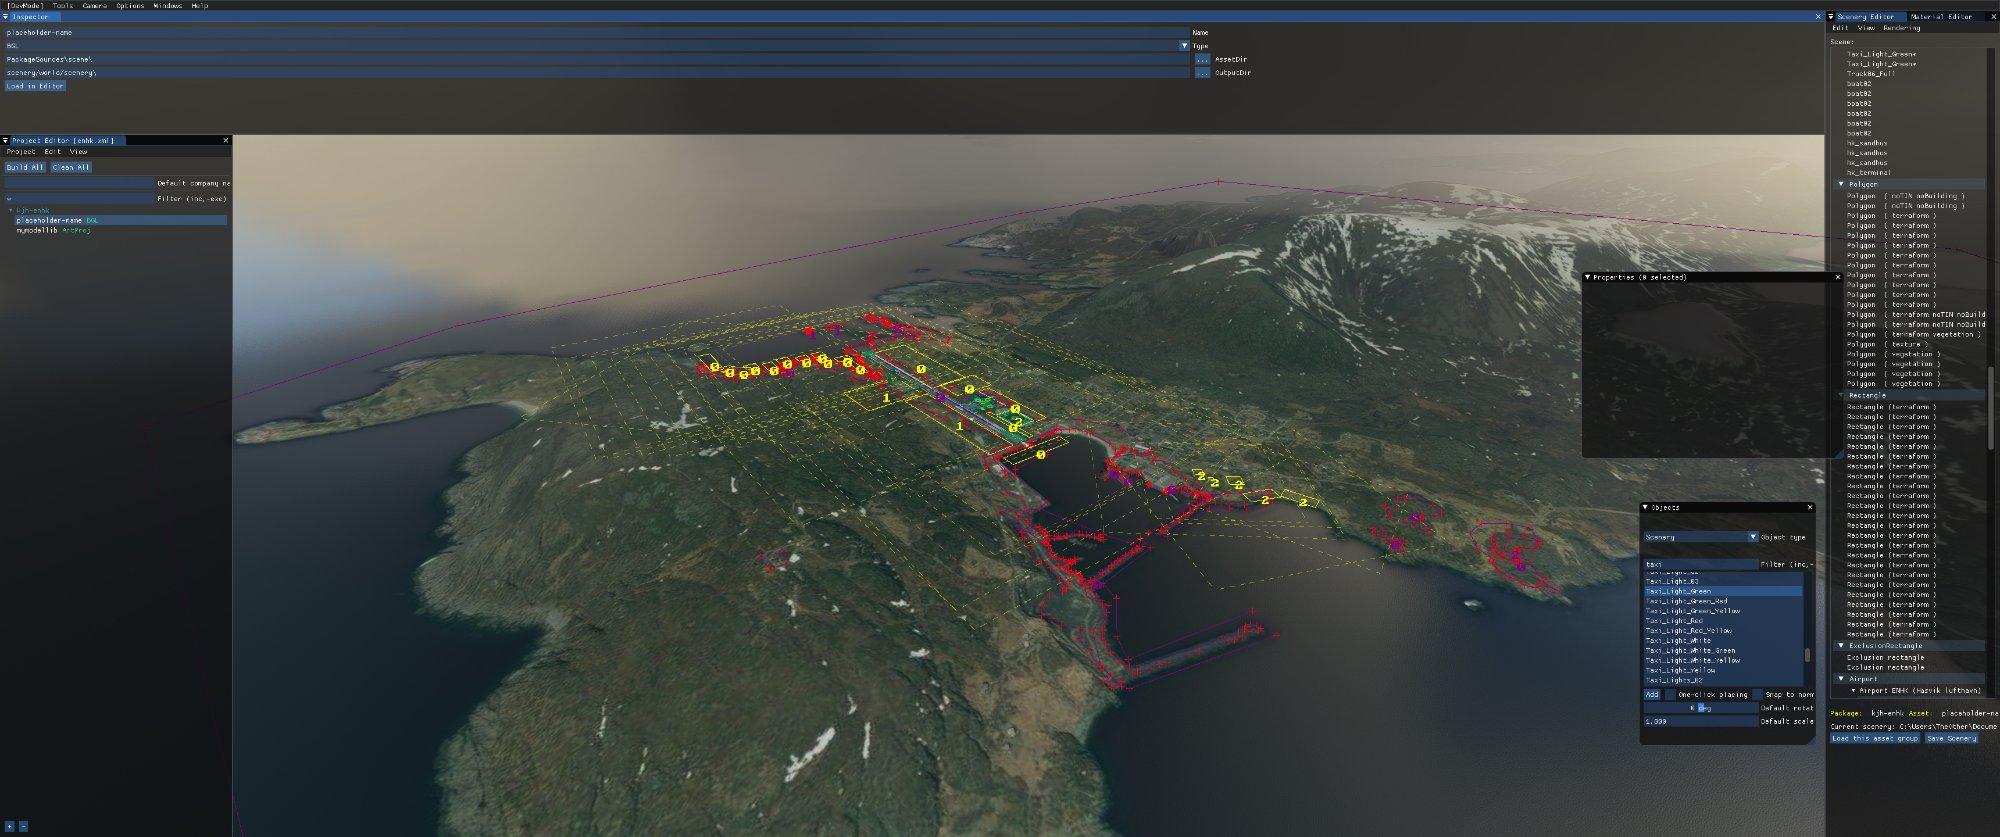 Microsoft Flight Simulator Screenshot 2020.11.19 - 15.56.26.56.jpg